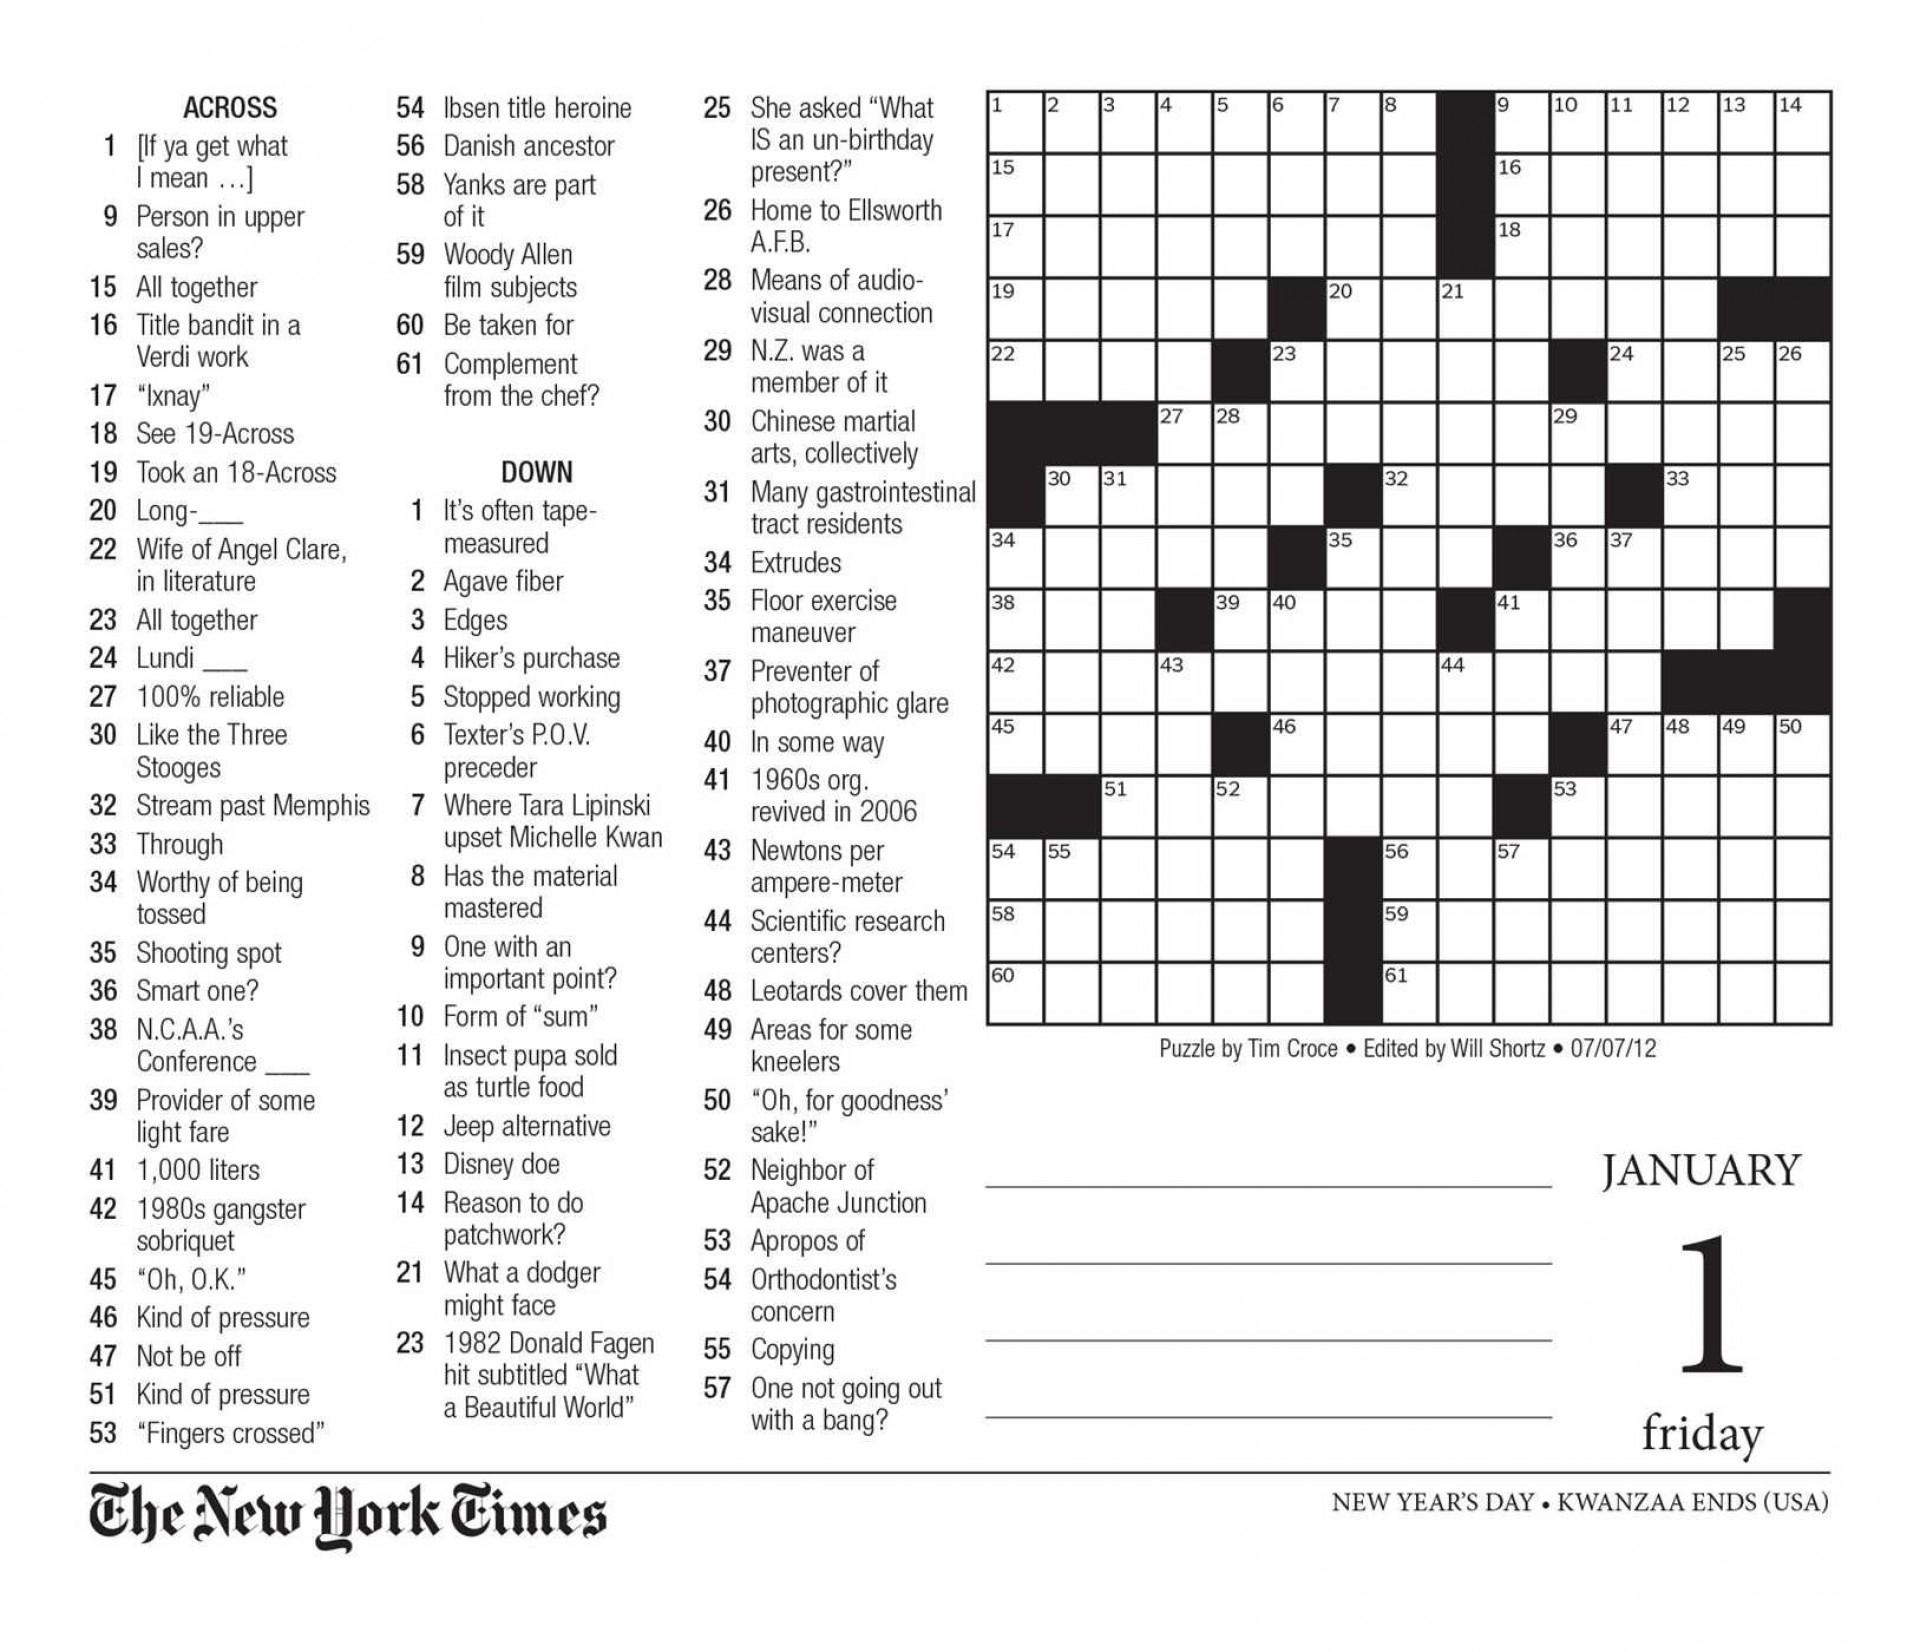 Free Printable Large Print Crossword Puzzles   M3U8 - Free Printable Large Print Crossword Puzzles